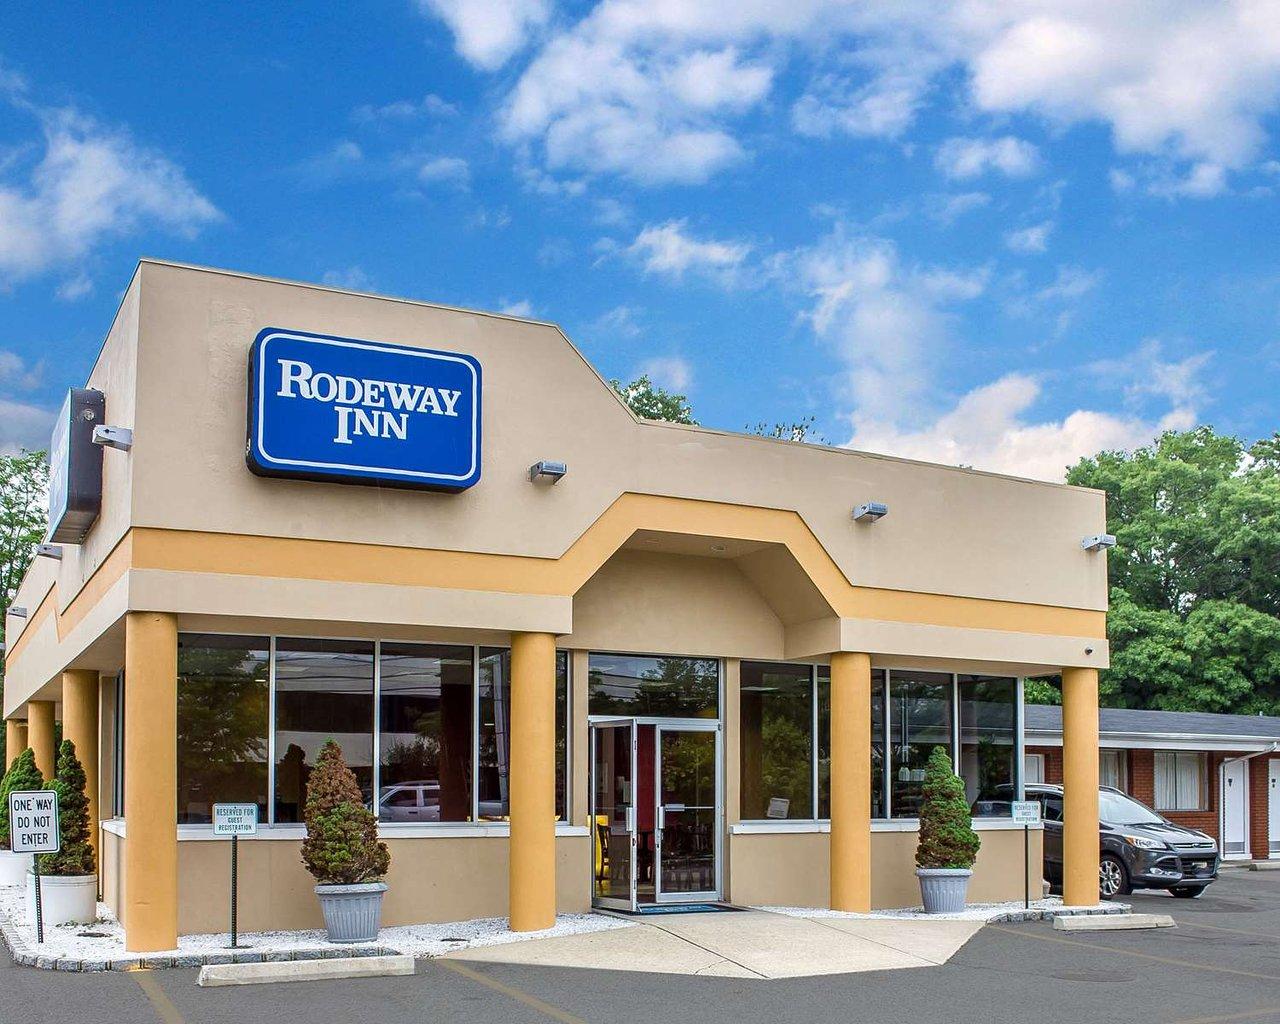 rodeway inn macarthur airport 89 9 9 updated 2019 prices rh tripadvisor com